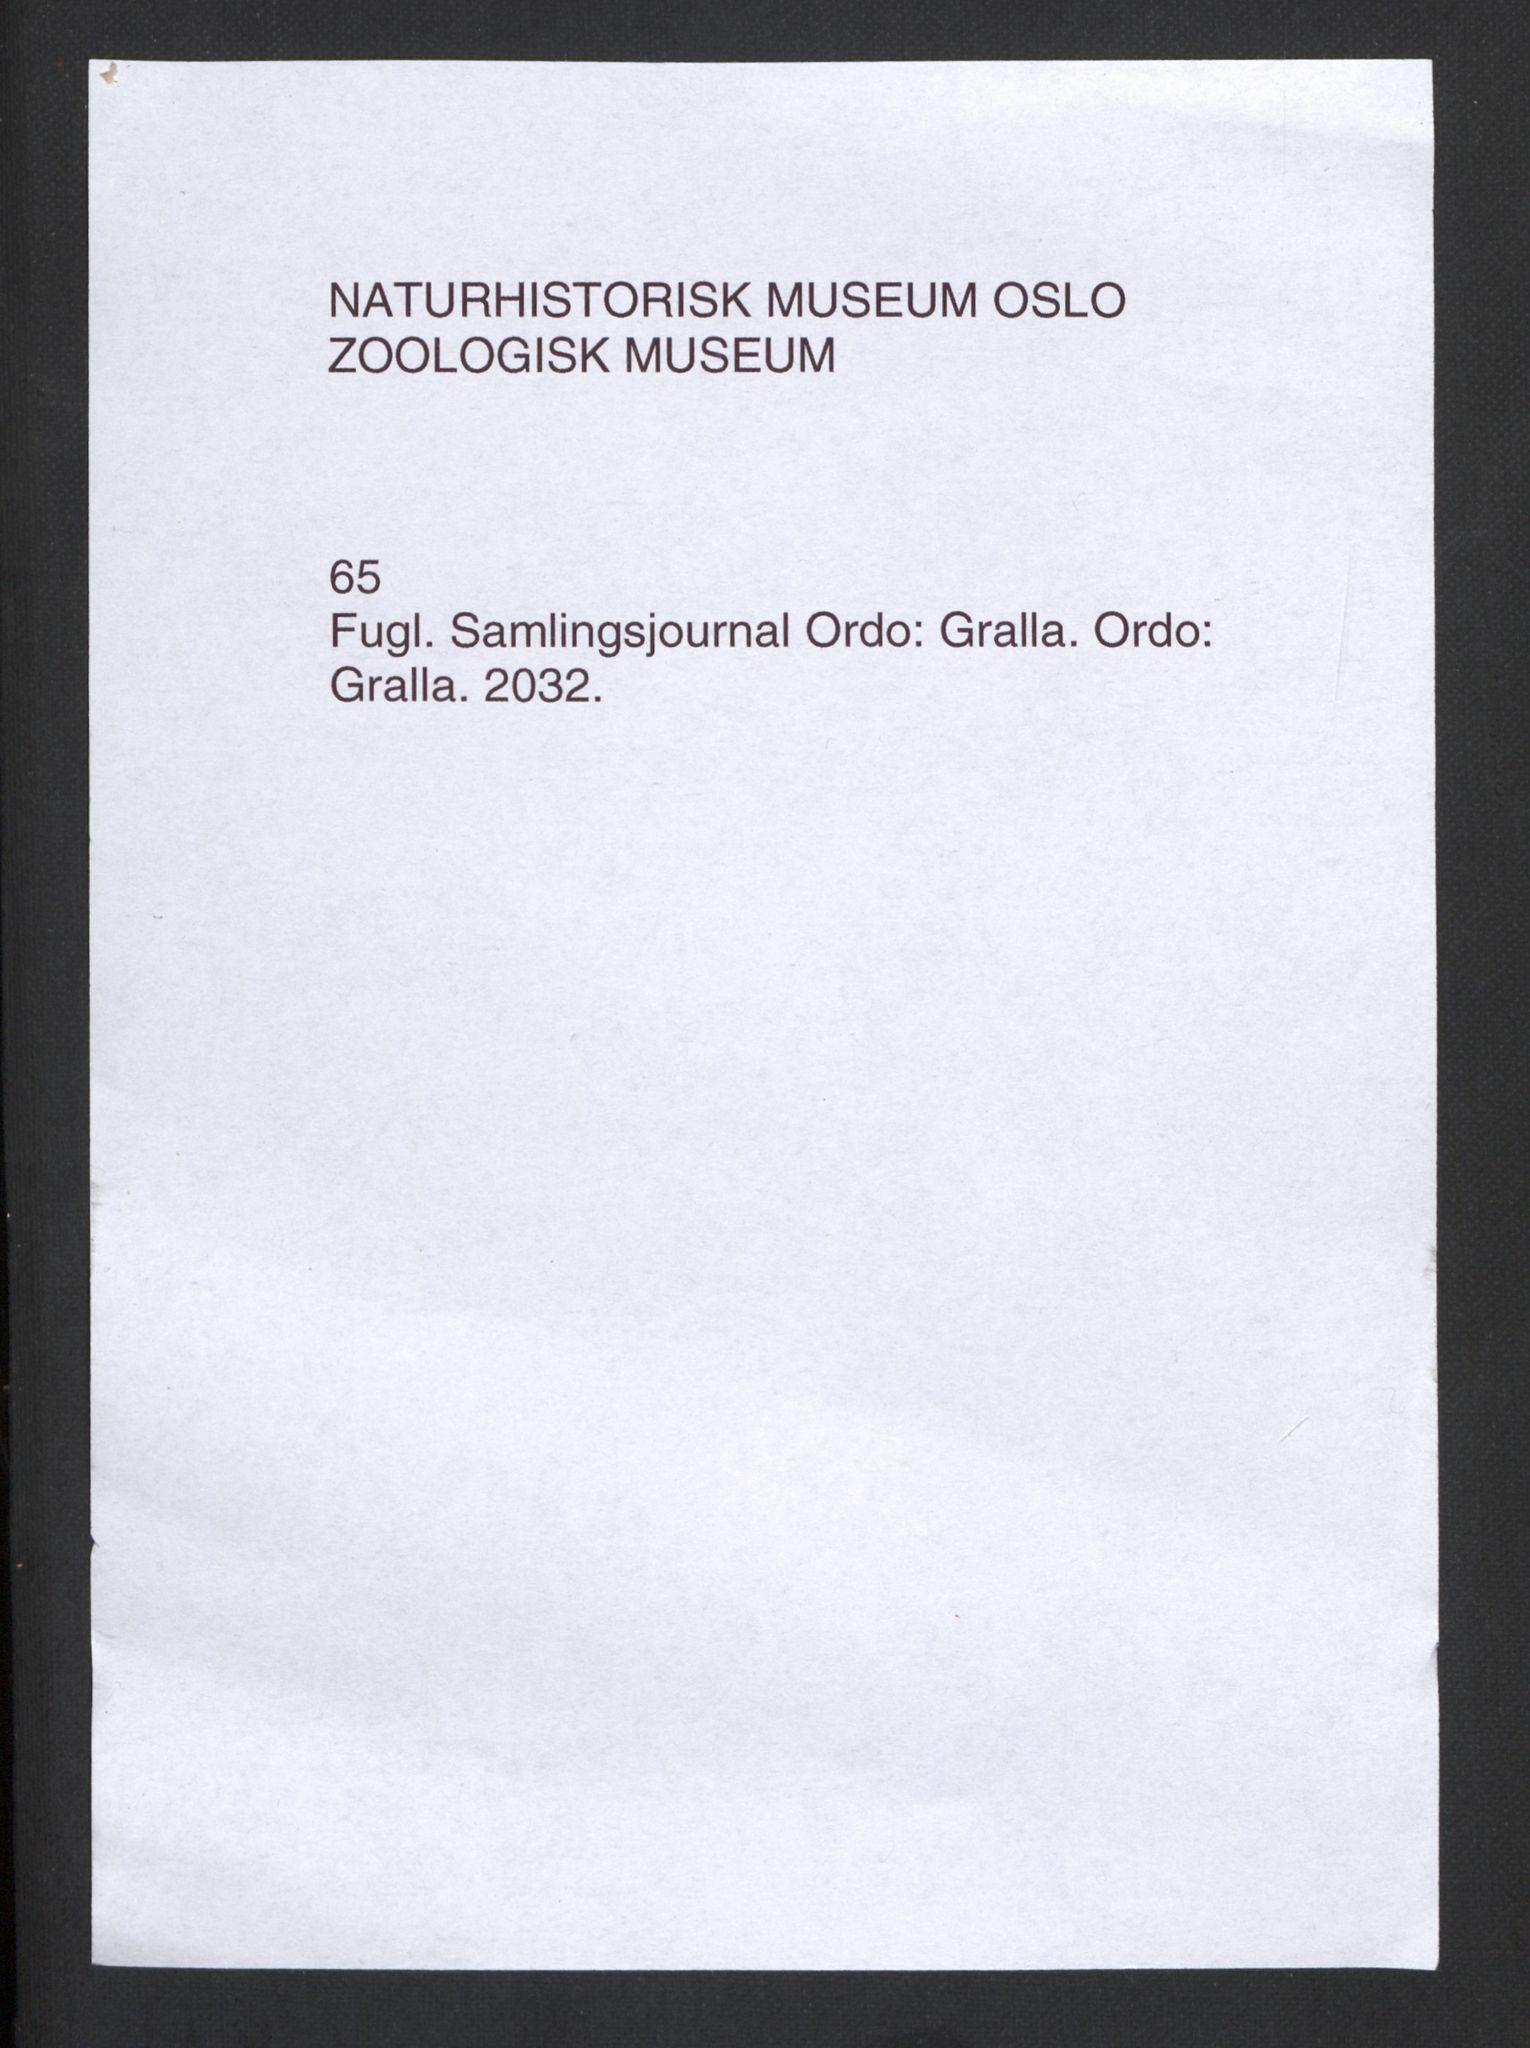 NHMO, Naturhistorisk museum (Oslo), 2: Fugl. Taksonomisk journal. Ordo: Gralla